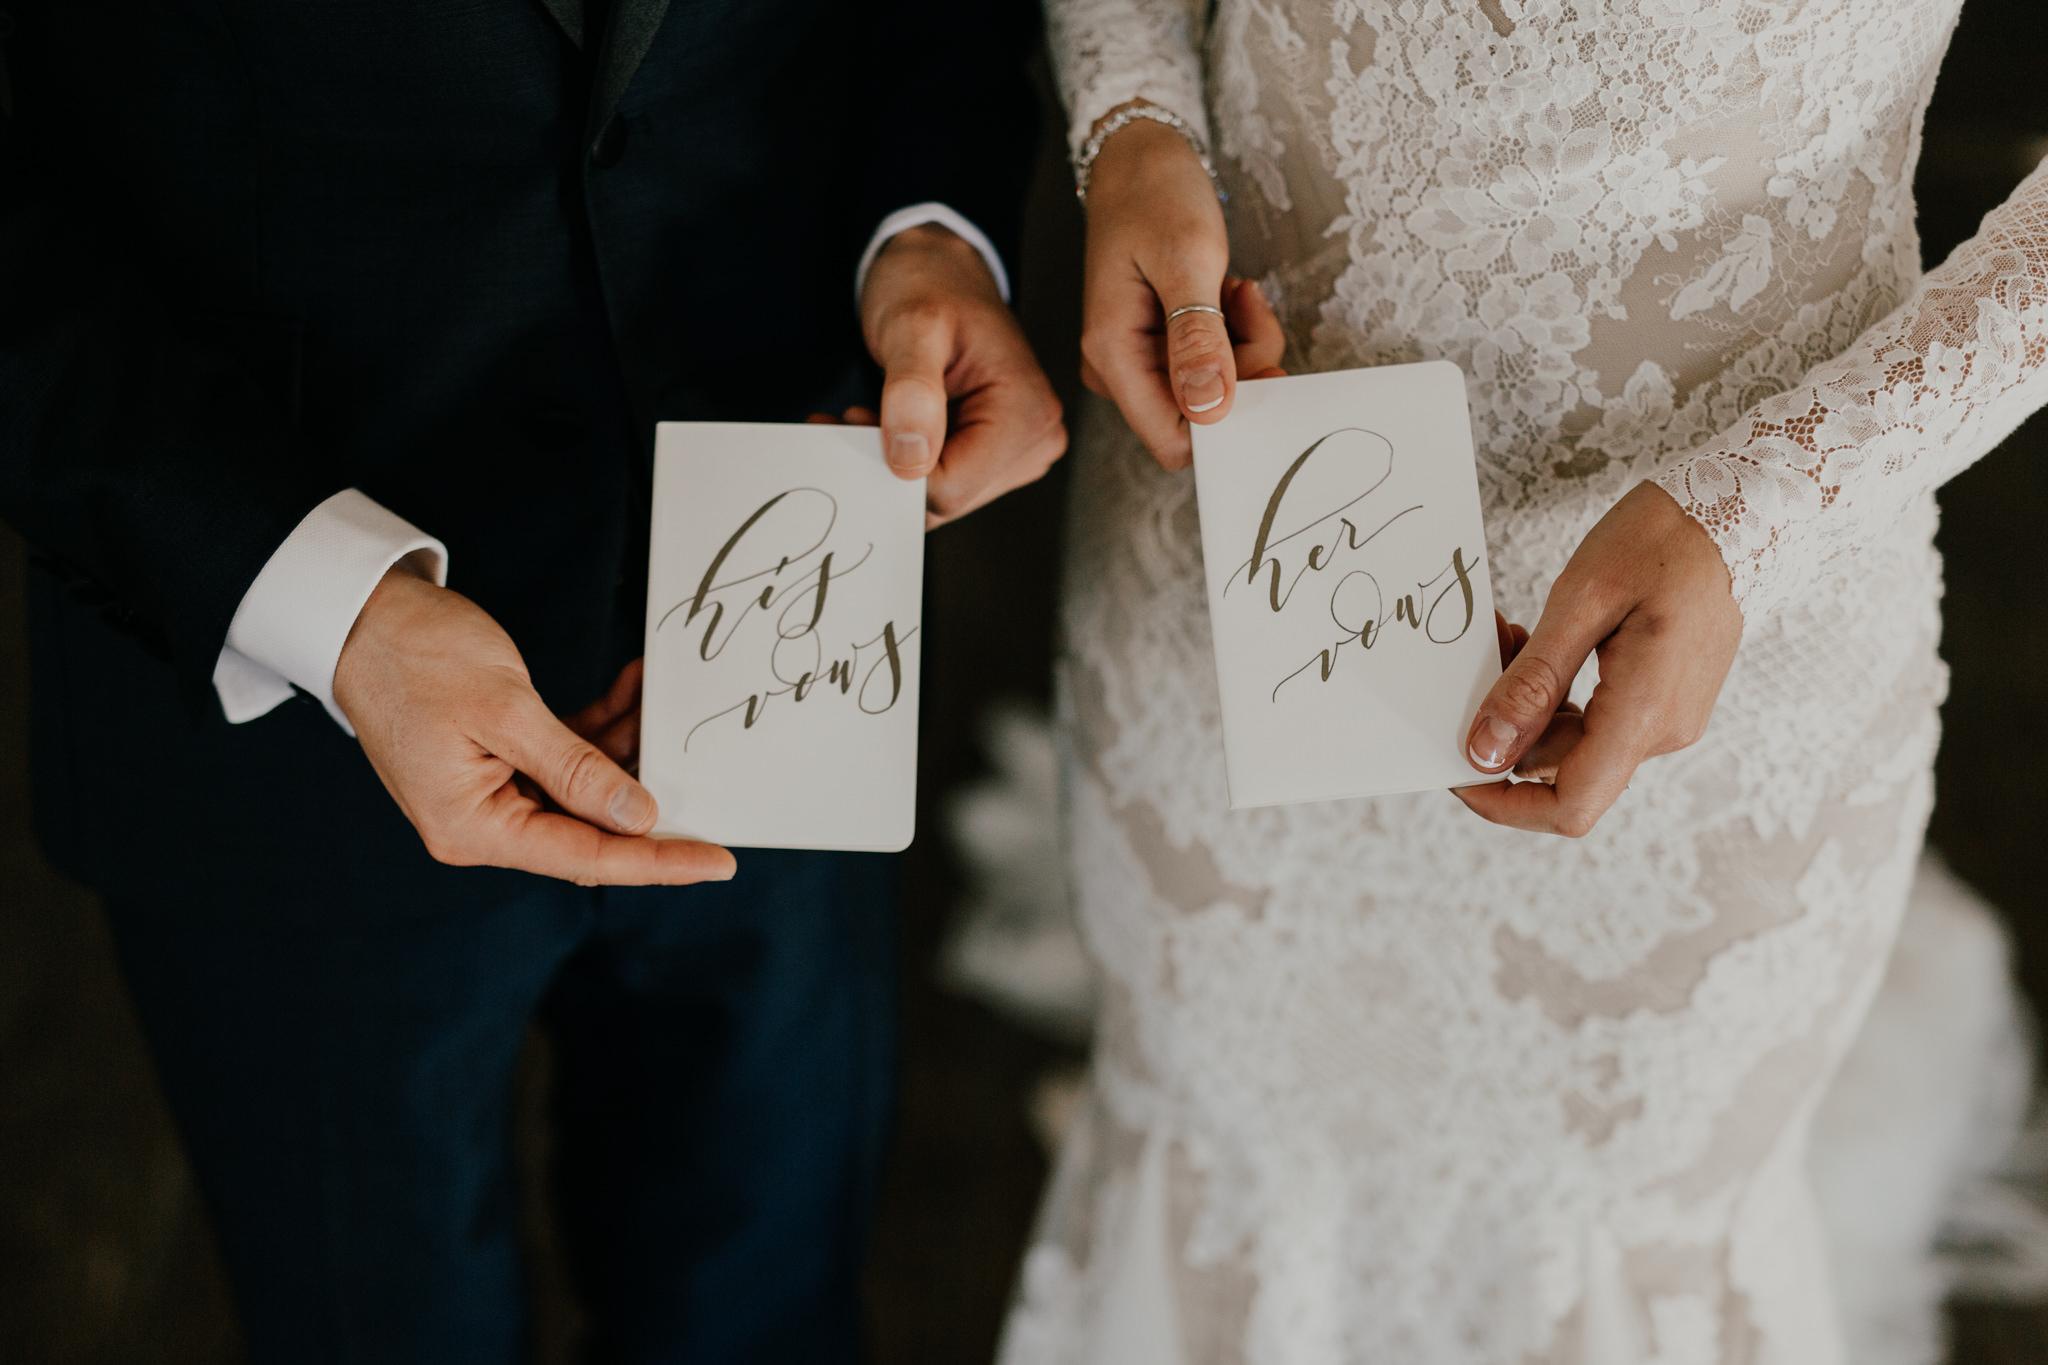 wedding-headlands-center-for-the-arts-sausalito-52.jpg